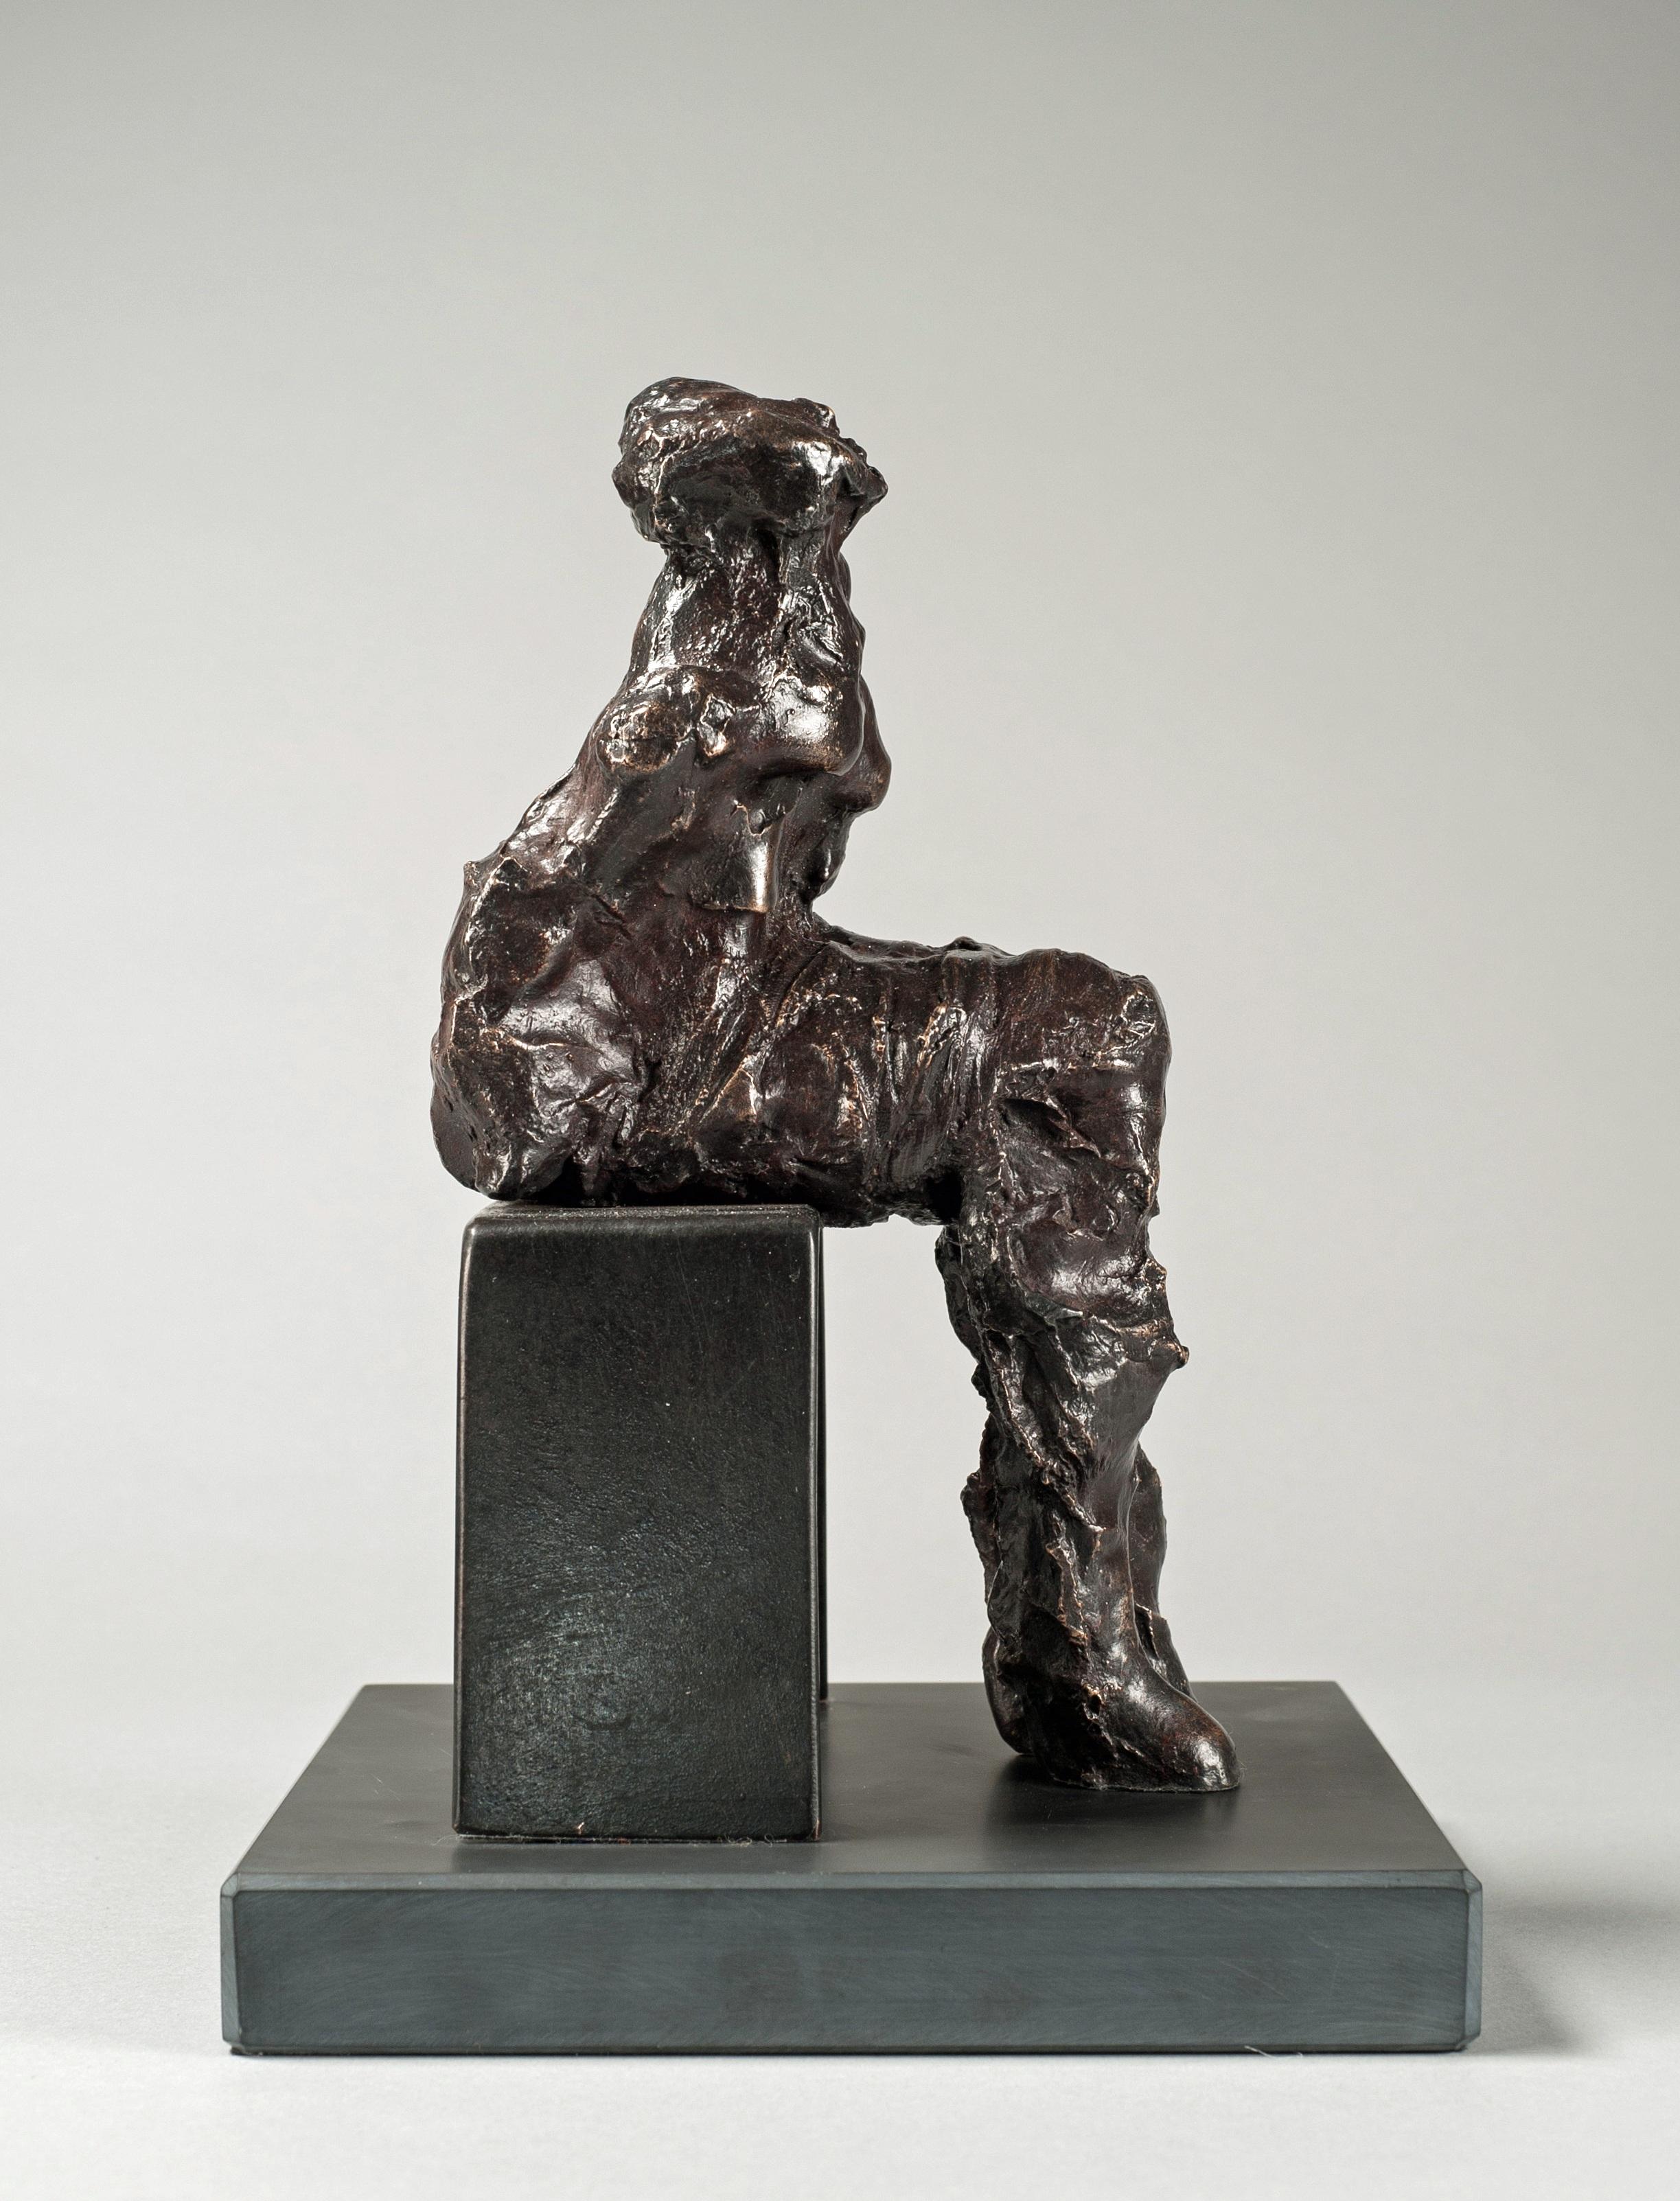 Sitting, bronze, by Maurice Blik